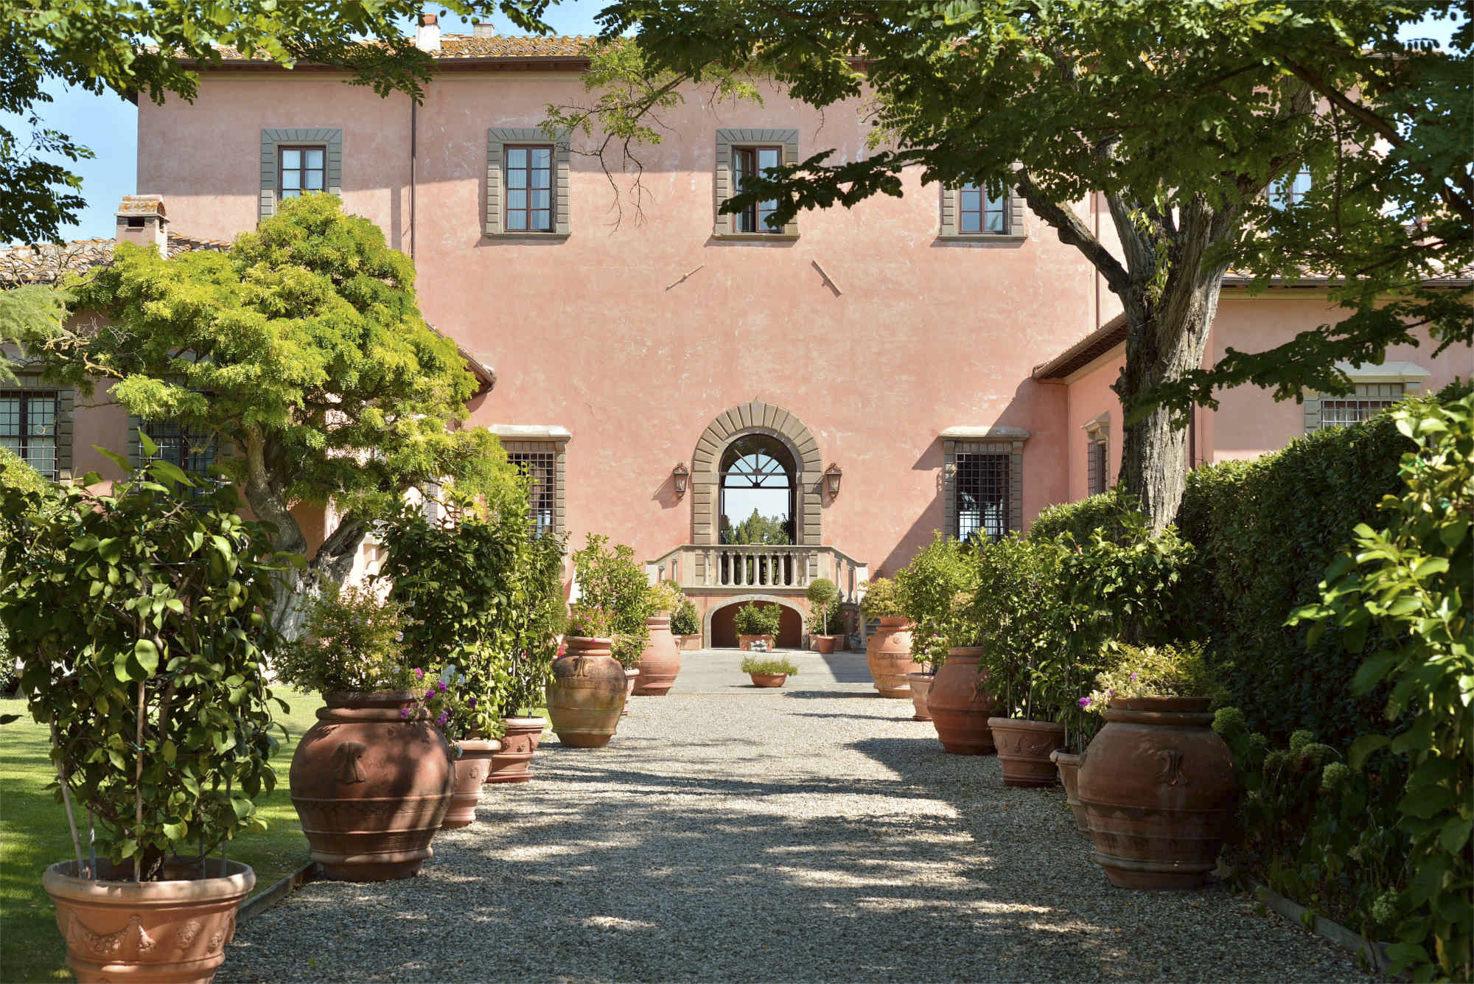 Entrance driveway of Villa Mangiacane